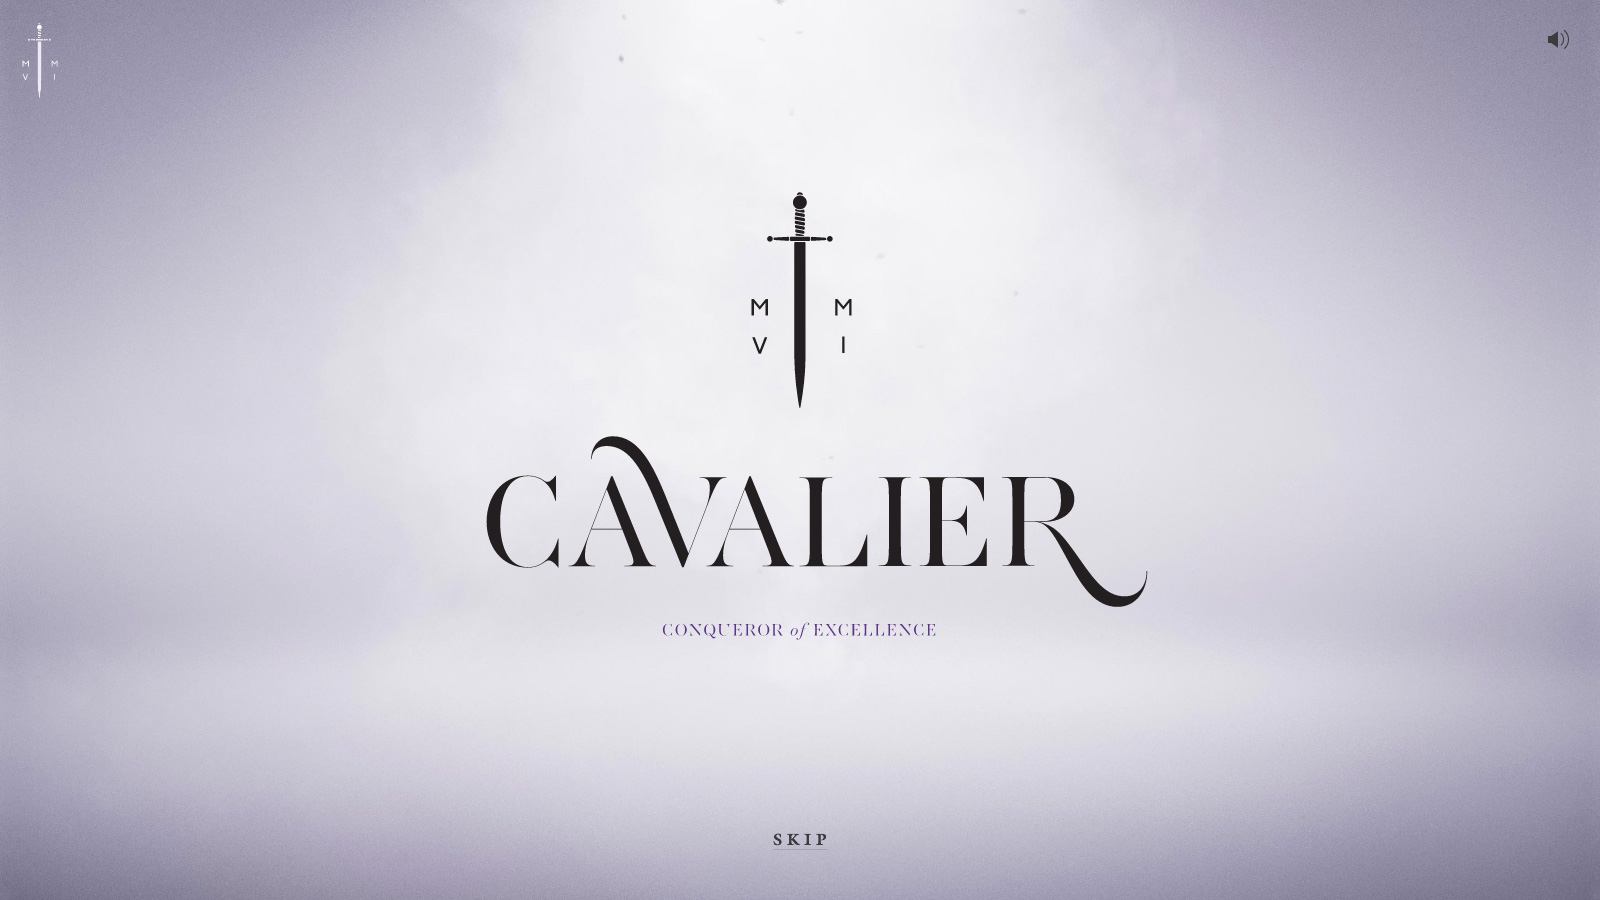 cavalier_slides_01